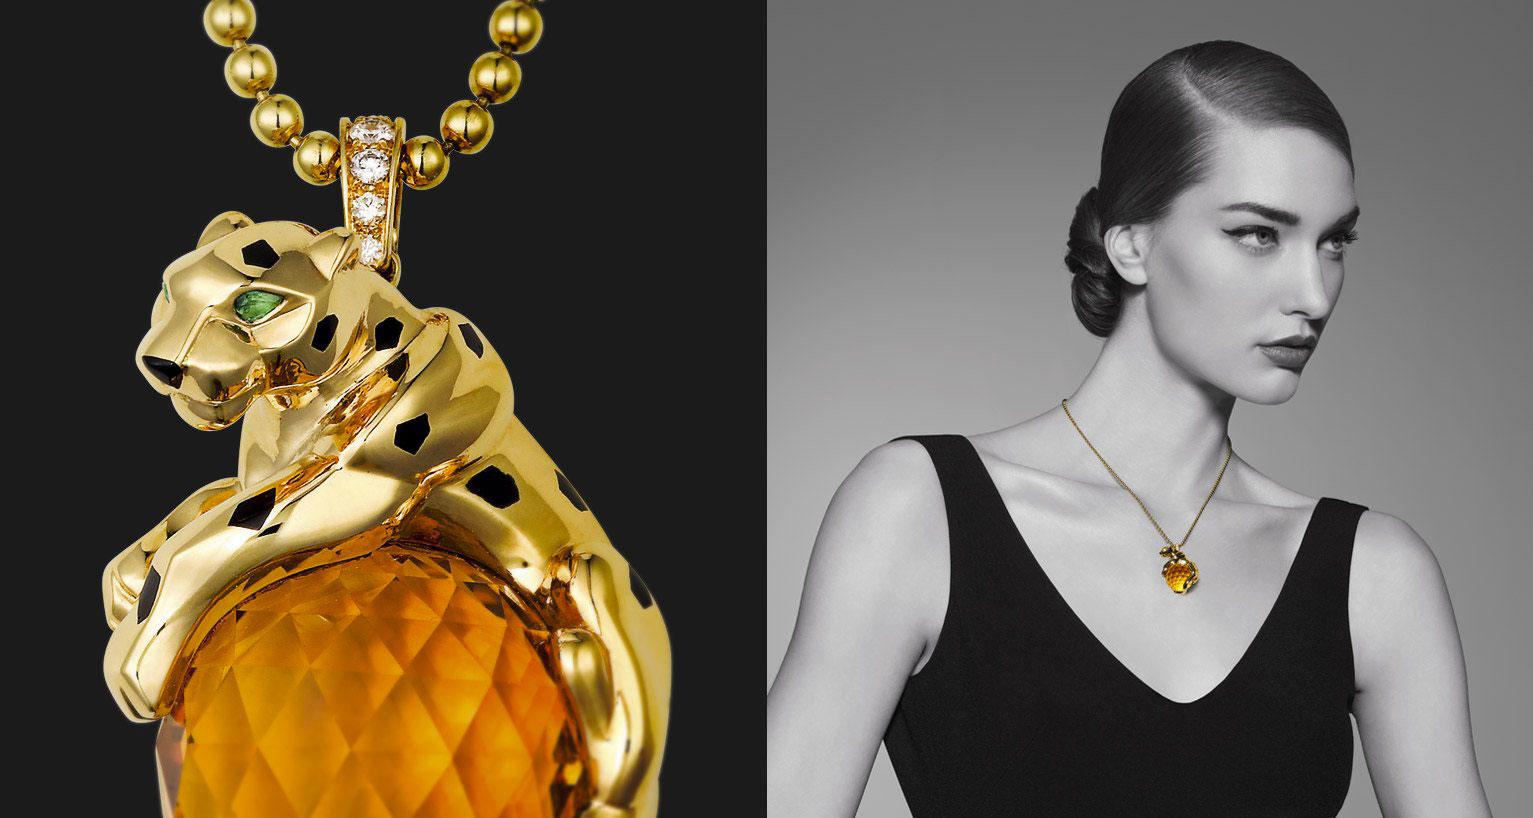 Necklace in yellow gold, onyx, black laquer, citrine, tsavorite garnets, diamonds.